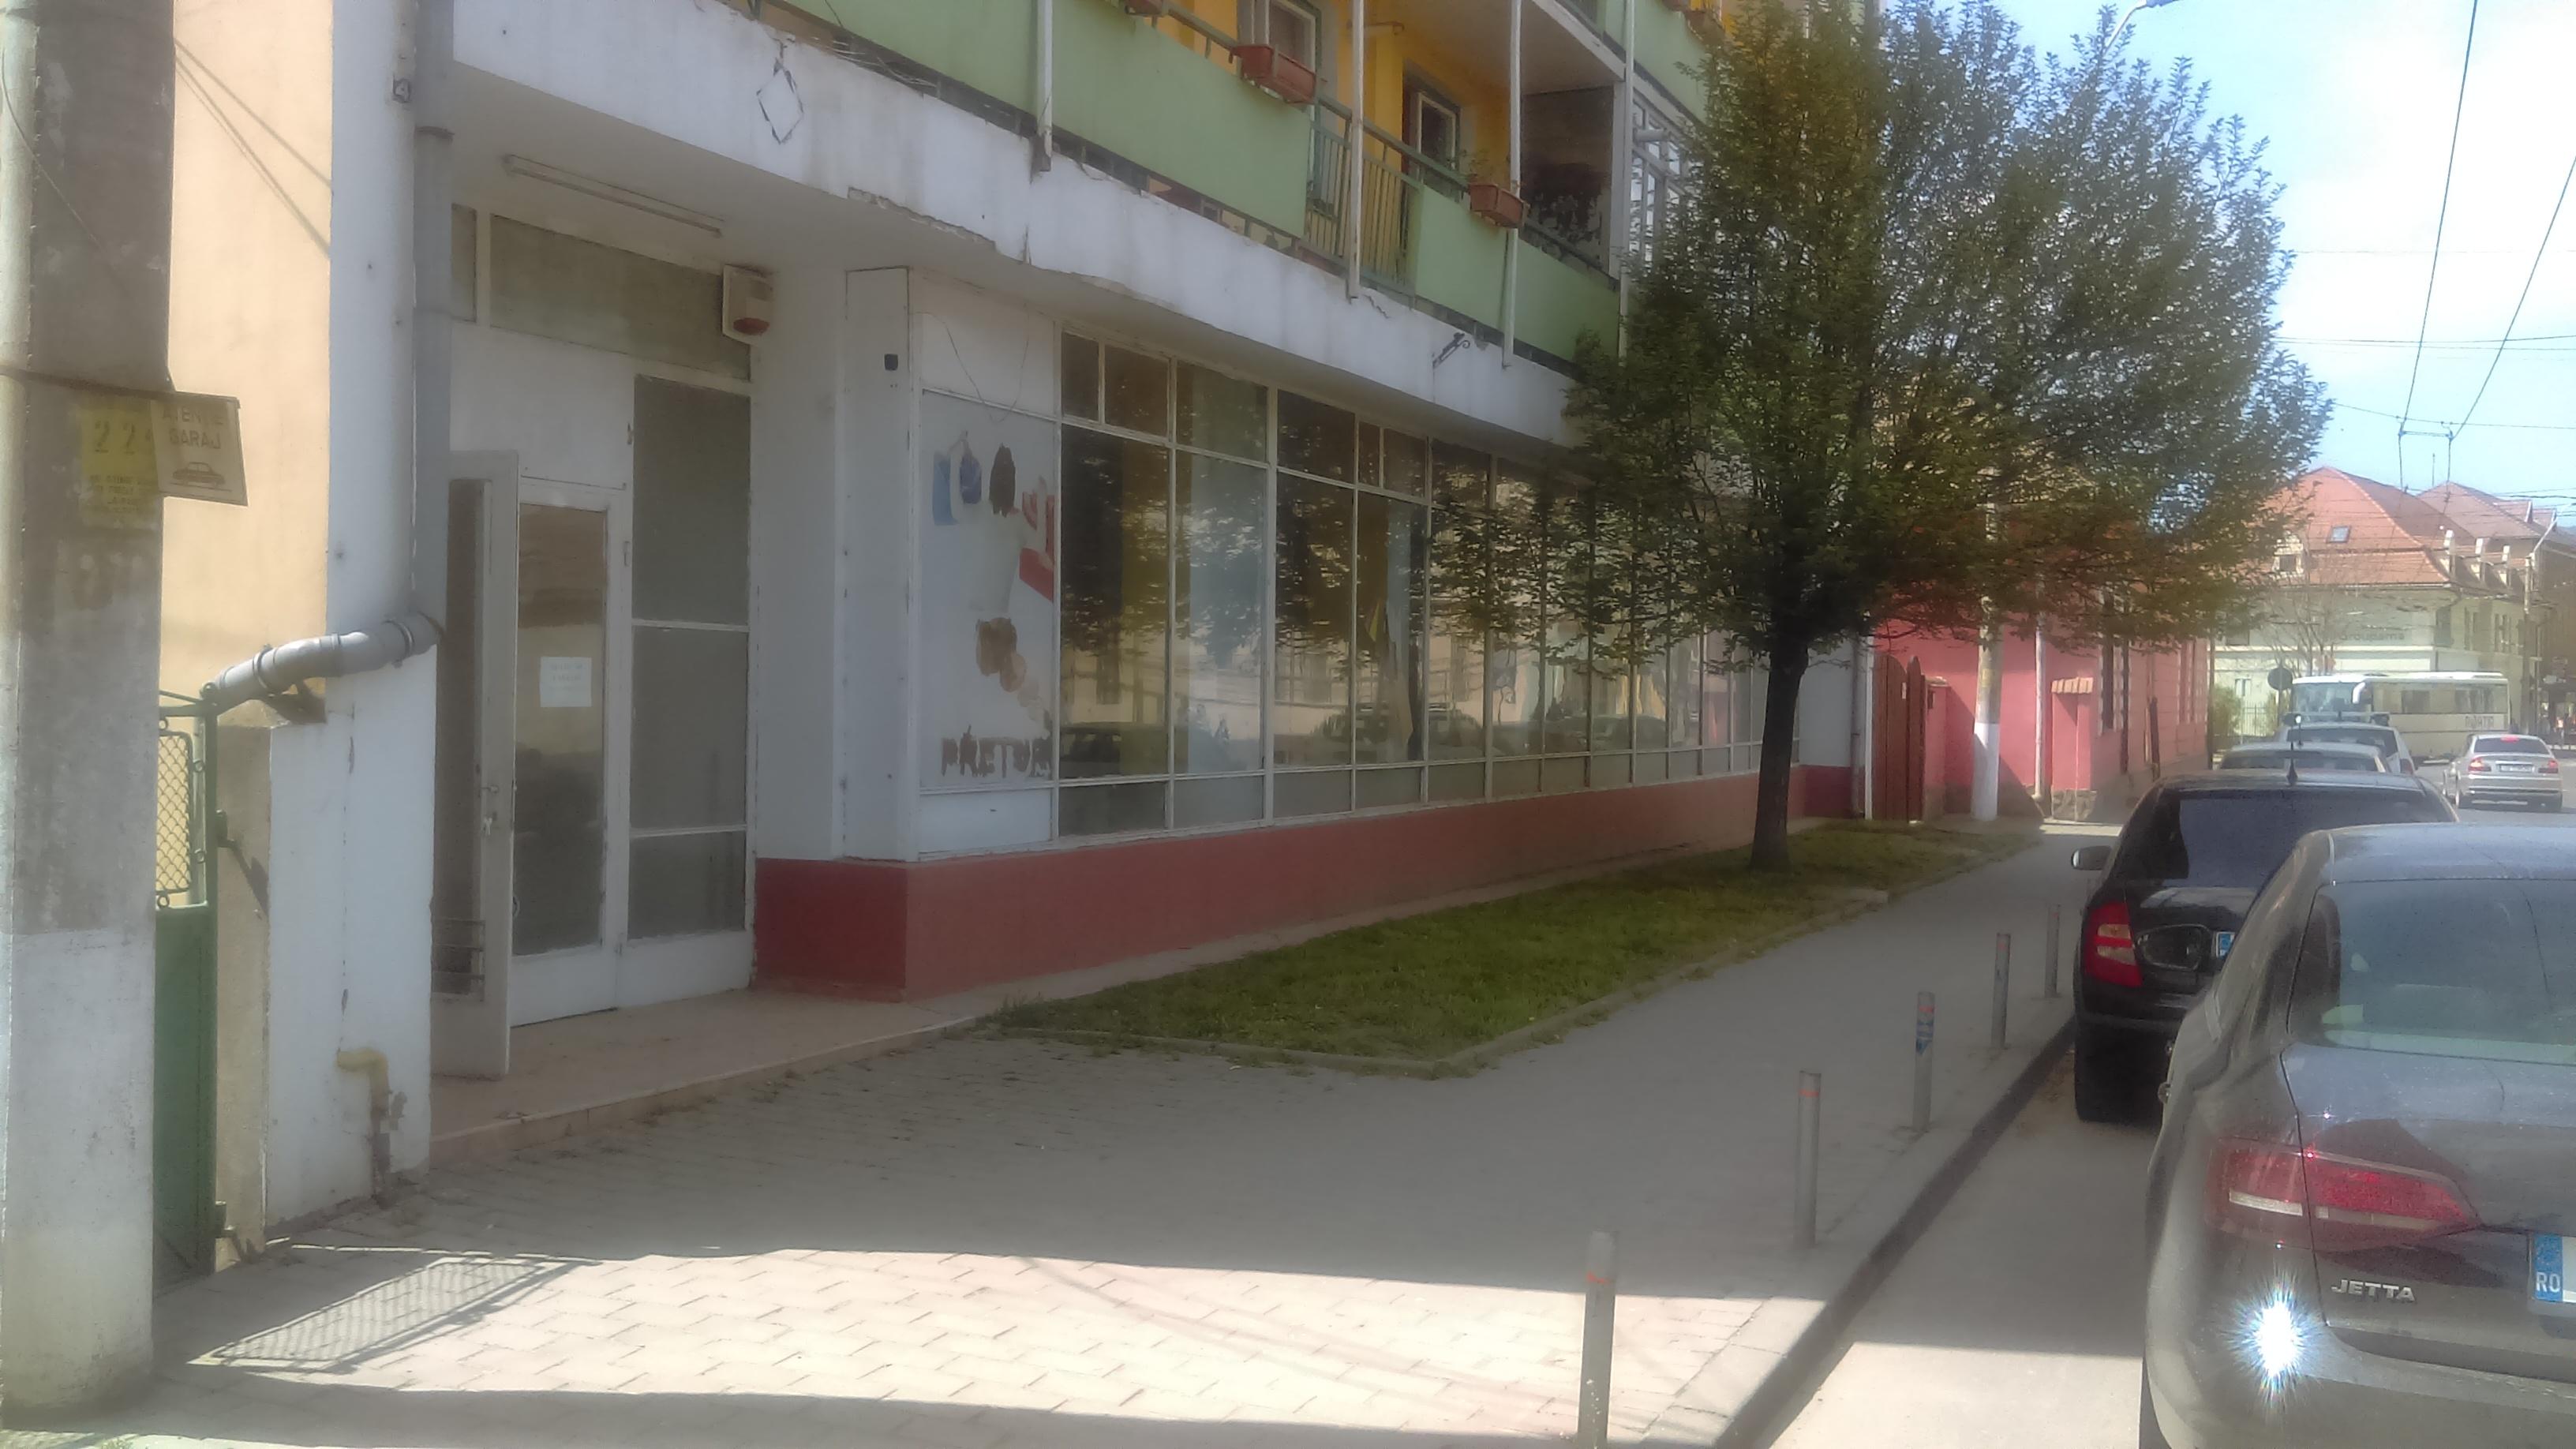 Spațiu comercial, strada Pompierilor, nr. 4, ap. 17, Mediaș